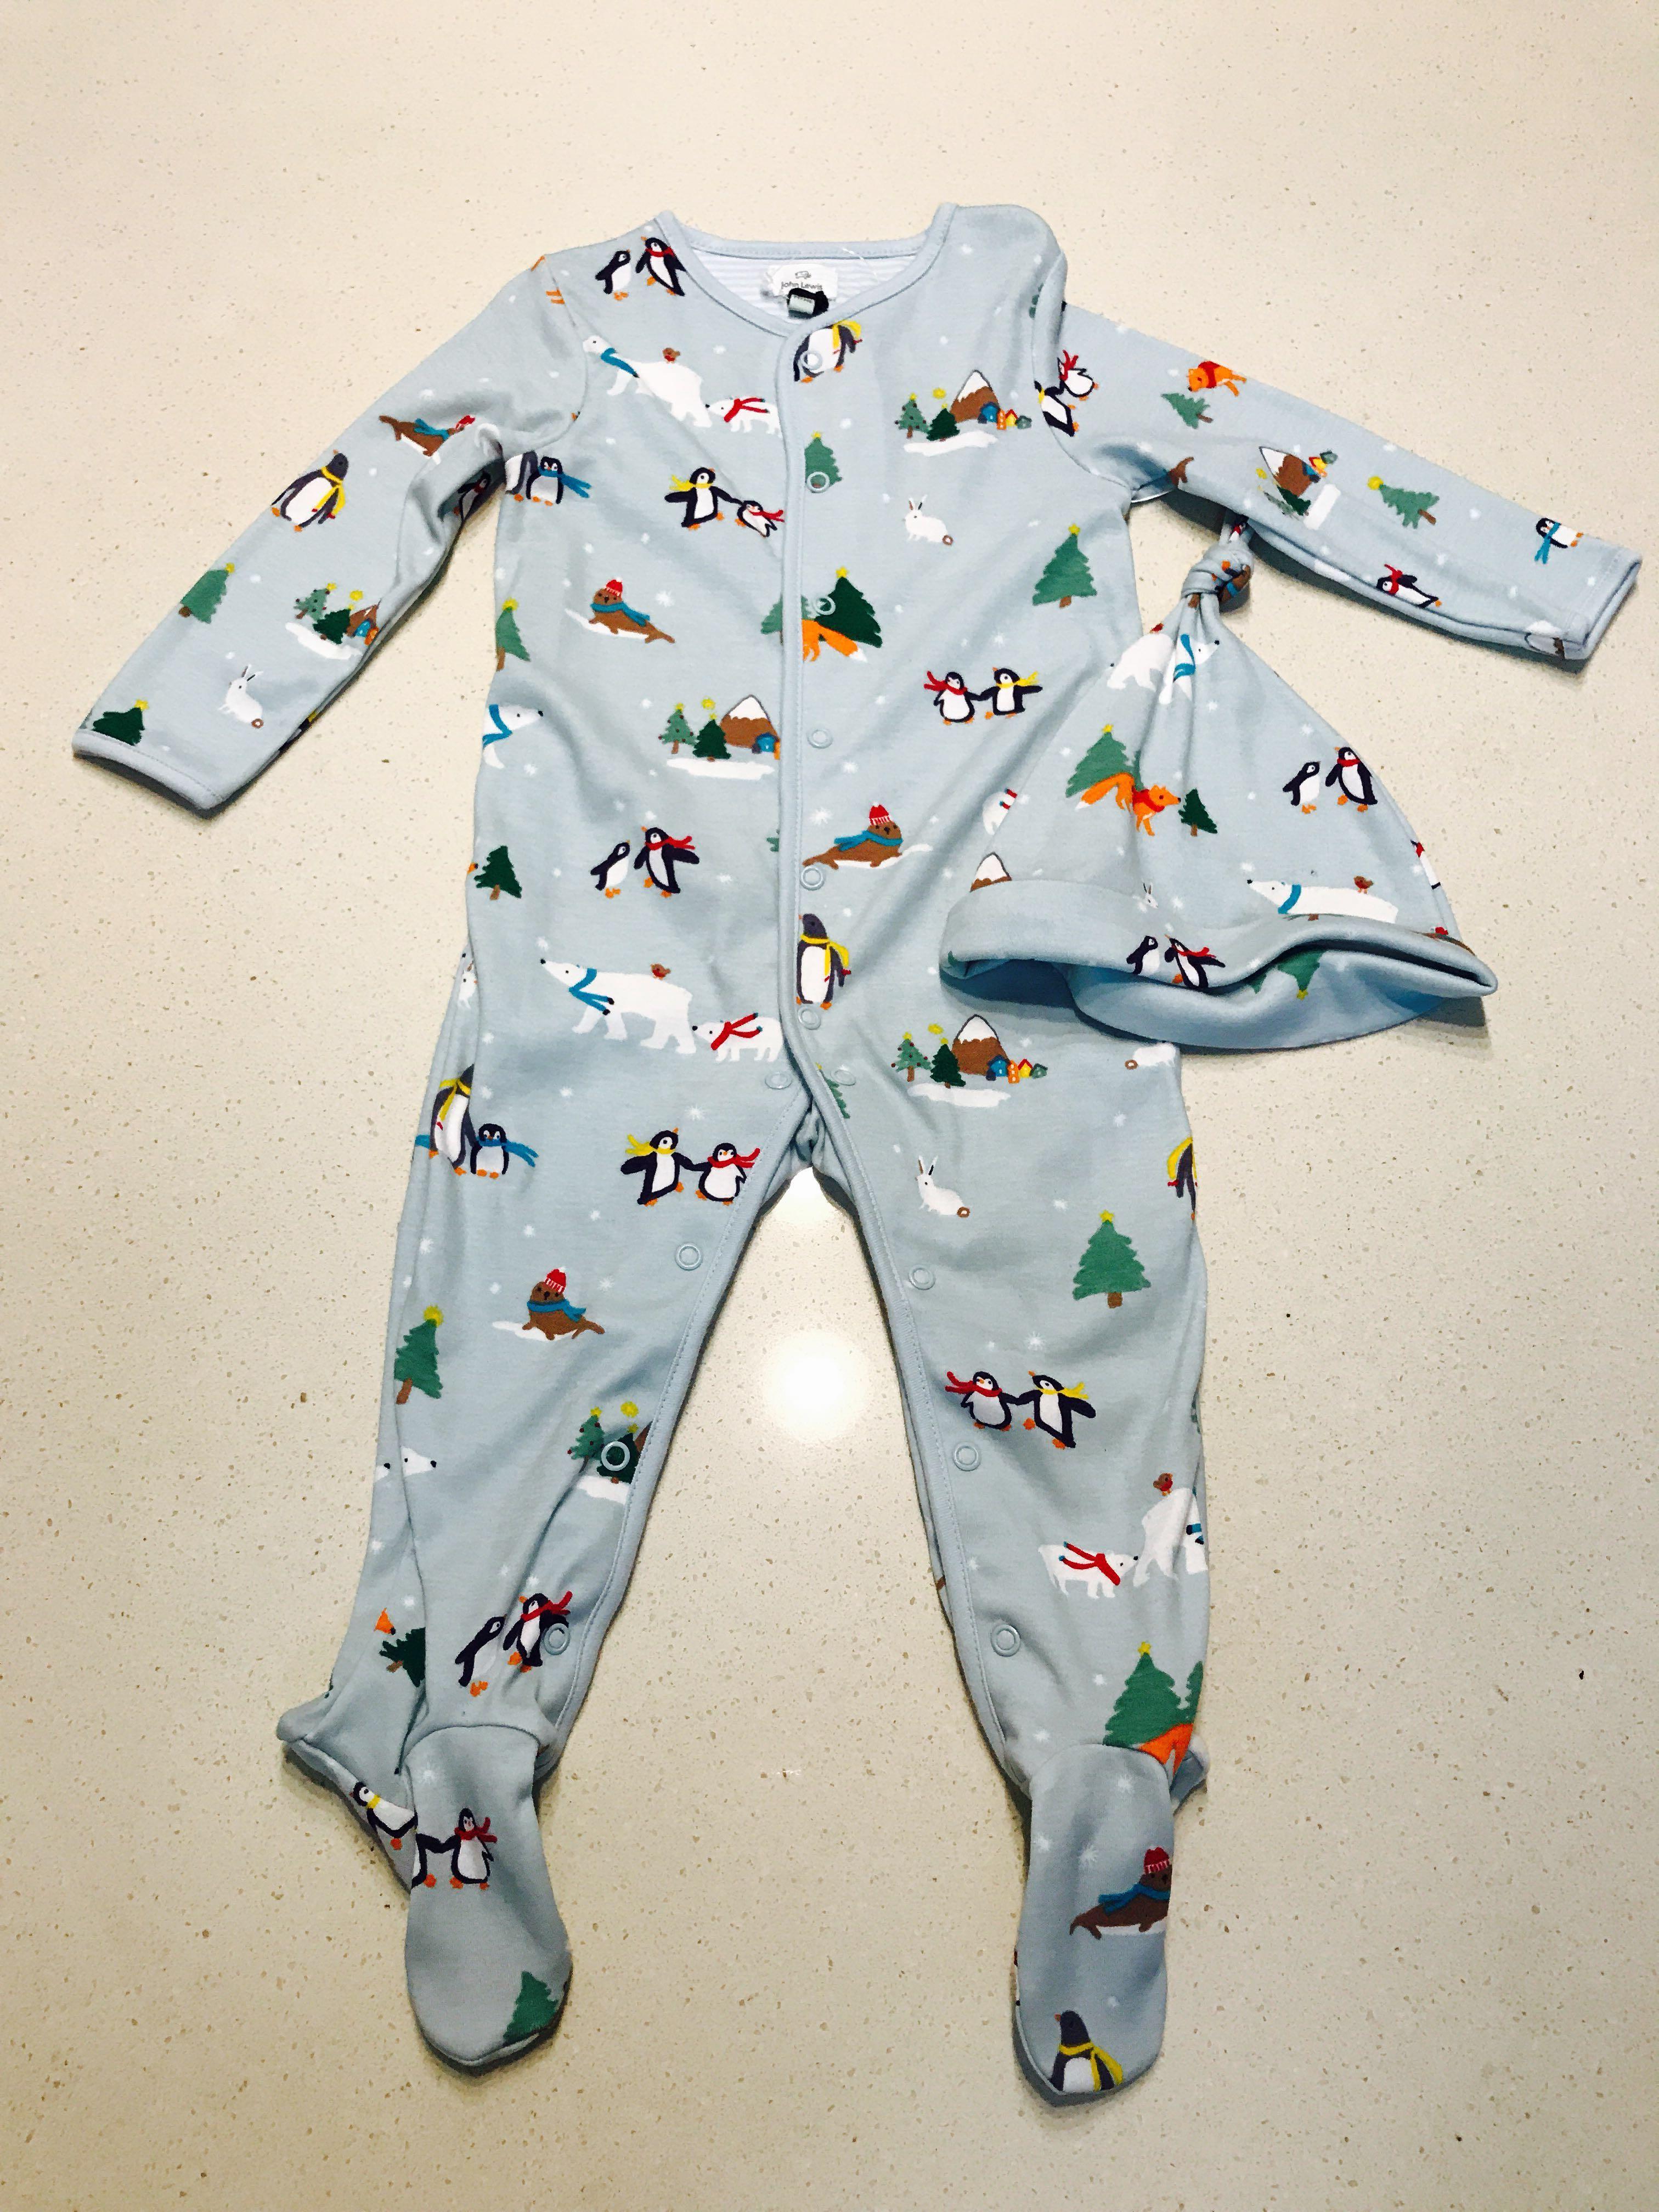 ce5cf3401 Brand New John Lewis UK Christmas Wonderland Penguin Polar Bears Joy Love  One piece Sleepsuit With Hat (like Mothercare le petit sea apple gap next  ...